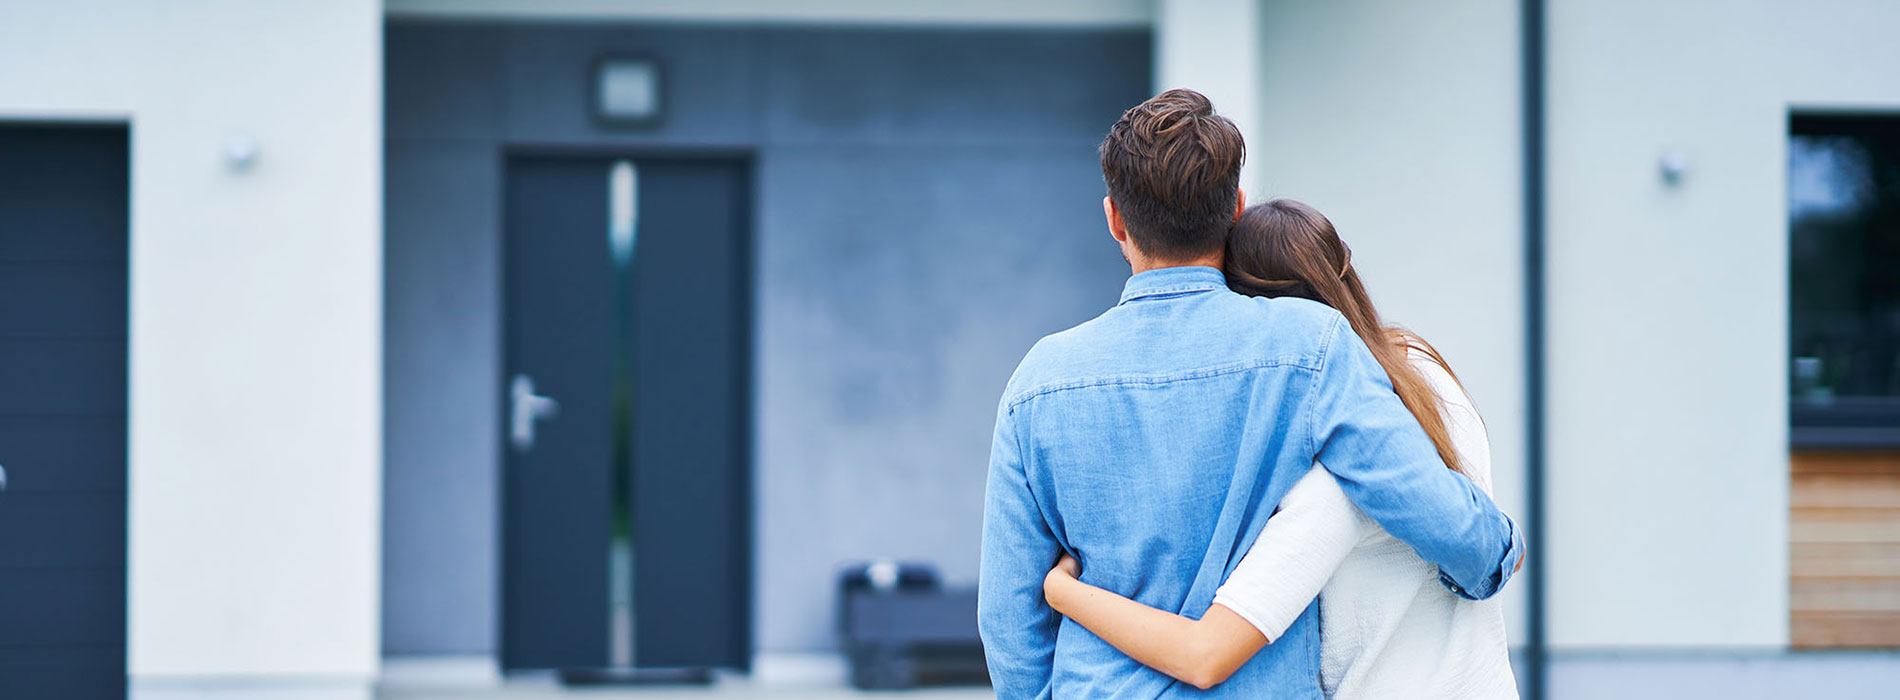 Junges Paar vor neuem Haus